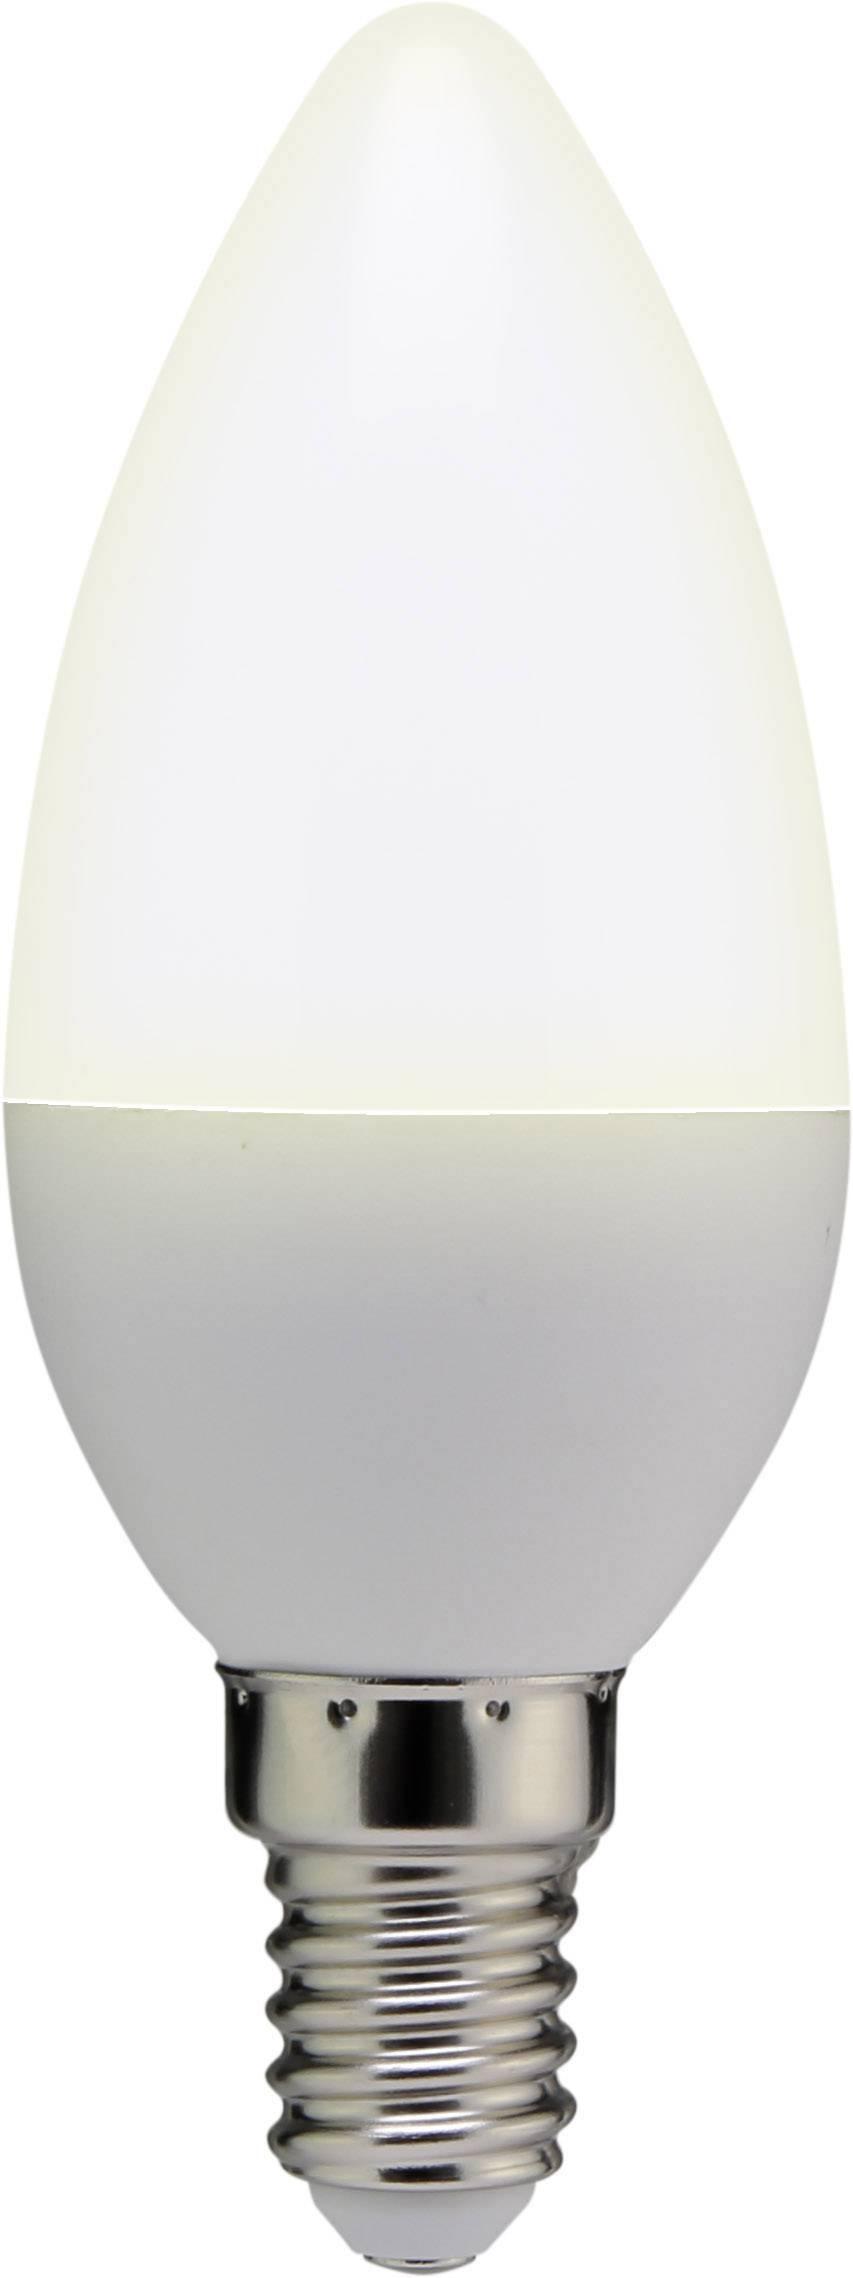 Blanc Ta37p249 230 5 16 E14 3 W25 Led Basetech Ampoule Chaud V zMqSUVp